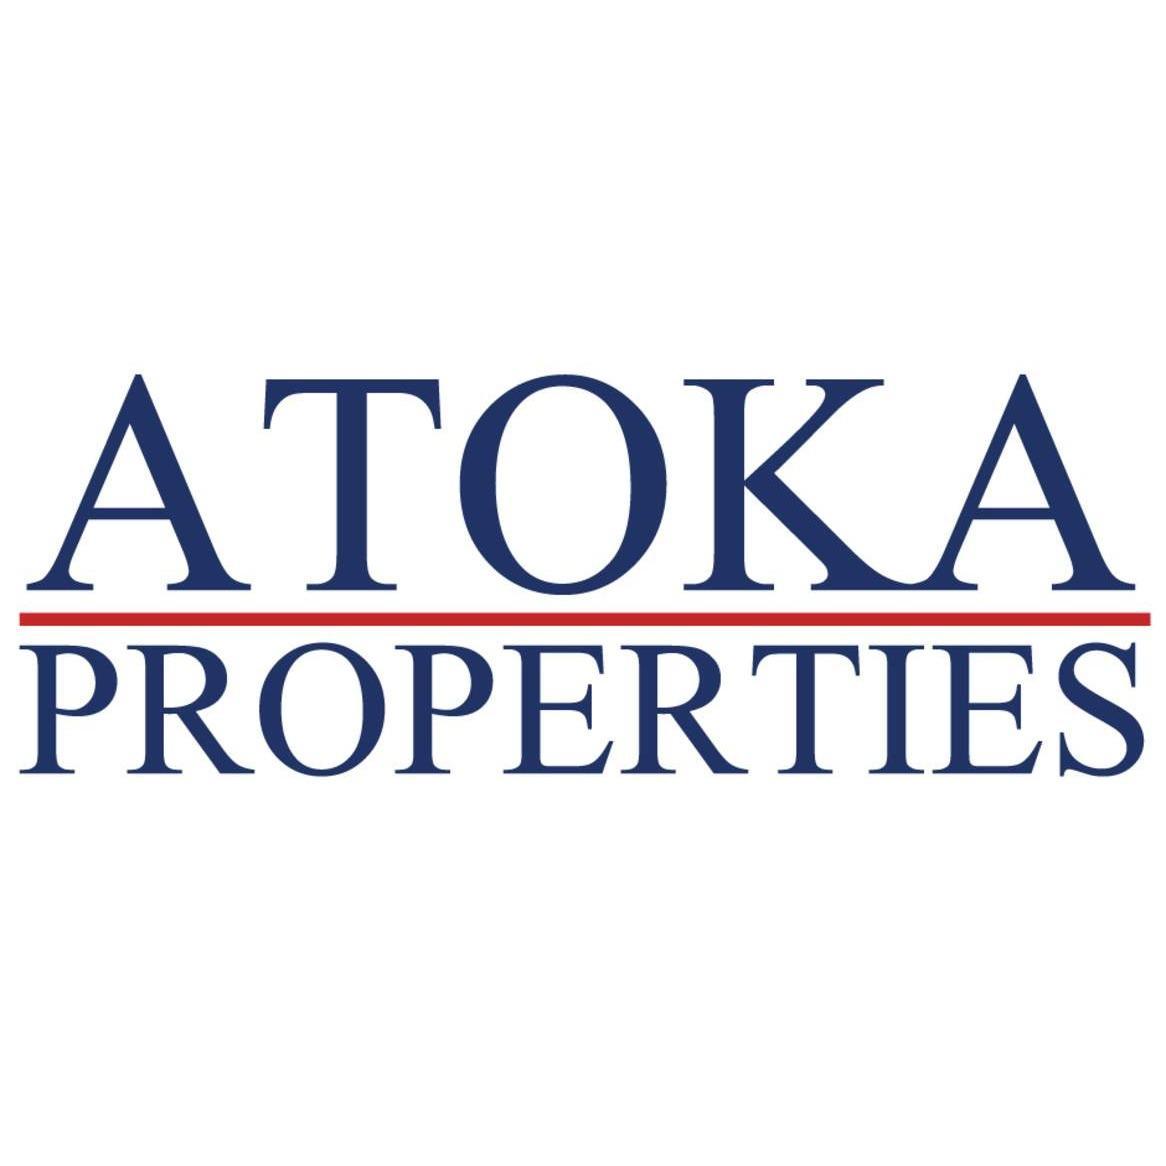 Middleburg Real Estate - Atoka Properties - Middleburg, VA - Real Estate Agents